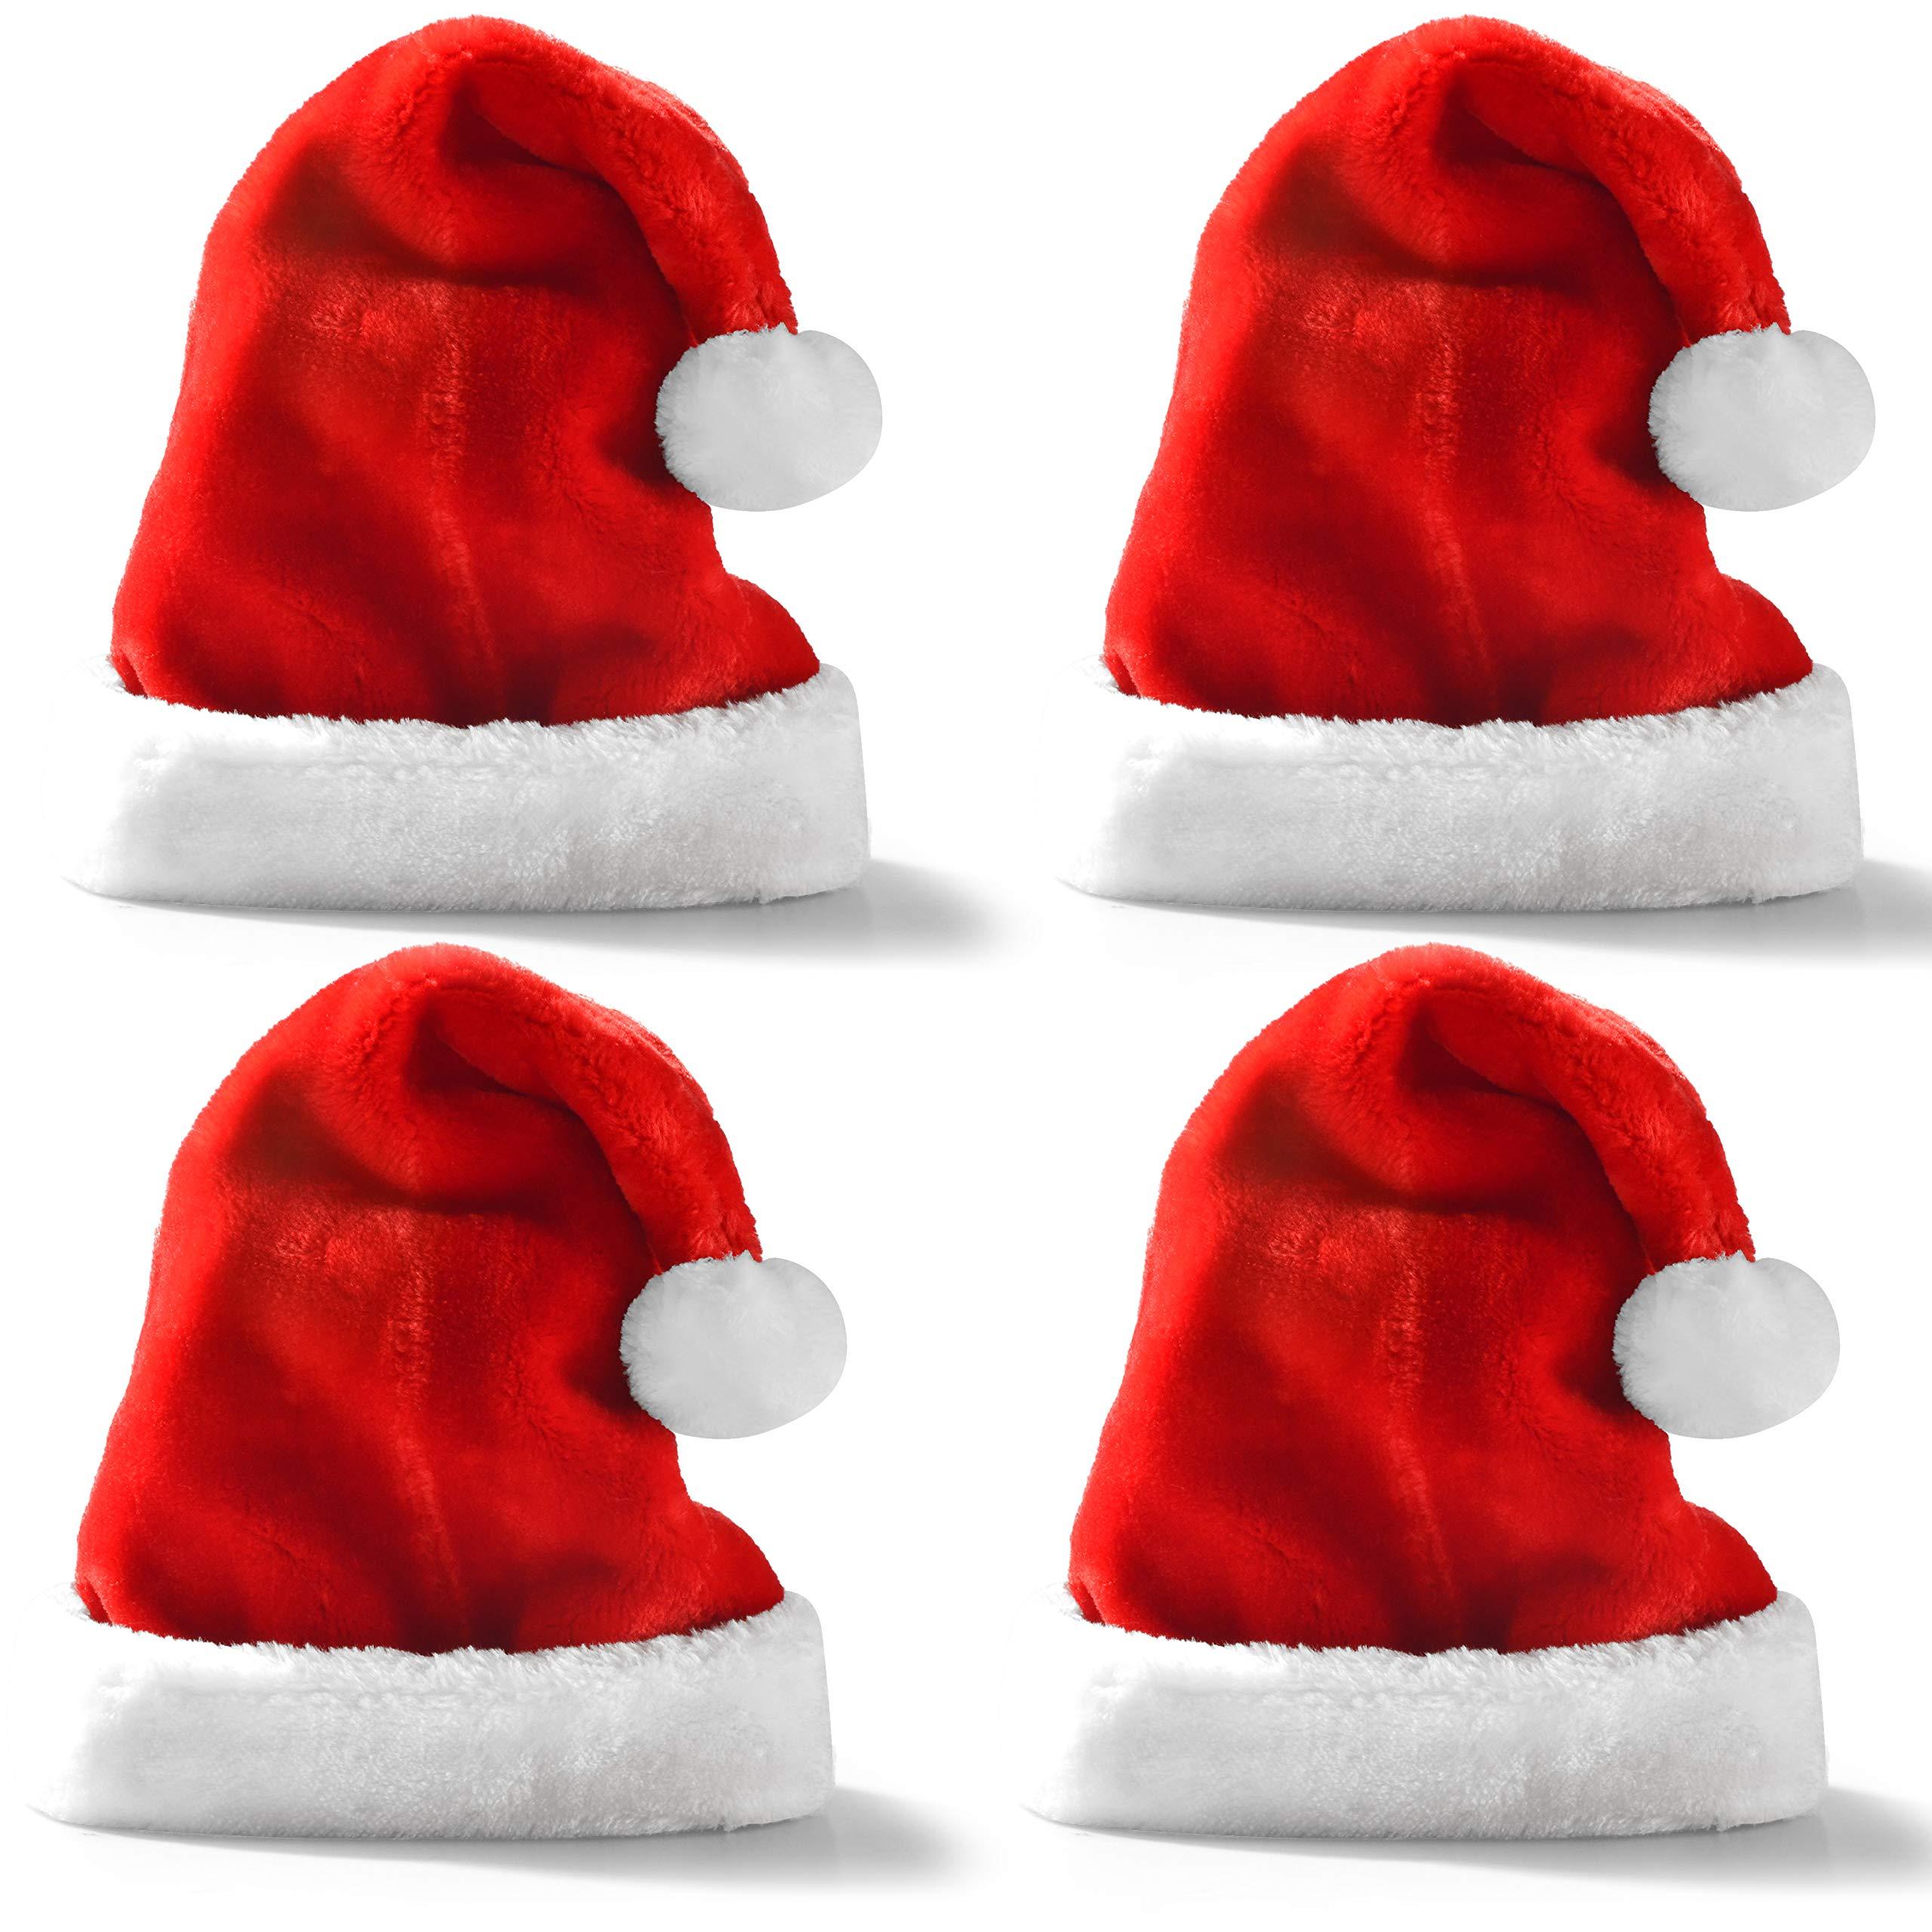 Premium Santa Hats (4 Pack), Plush Red Velvet Christmas Hats with White Cuffs by JOYIN